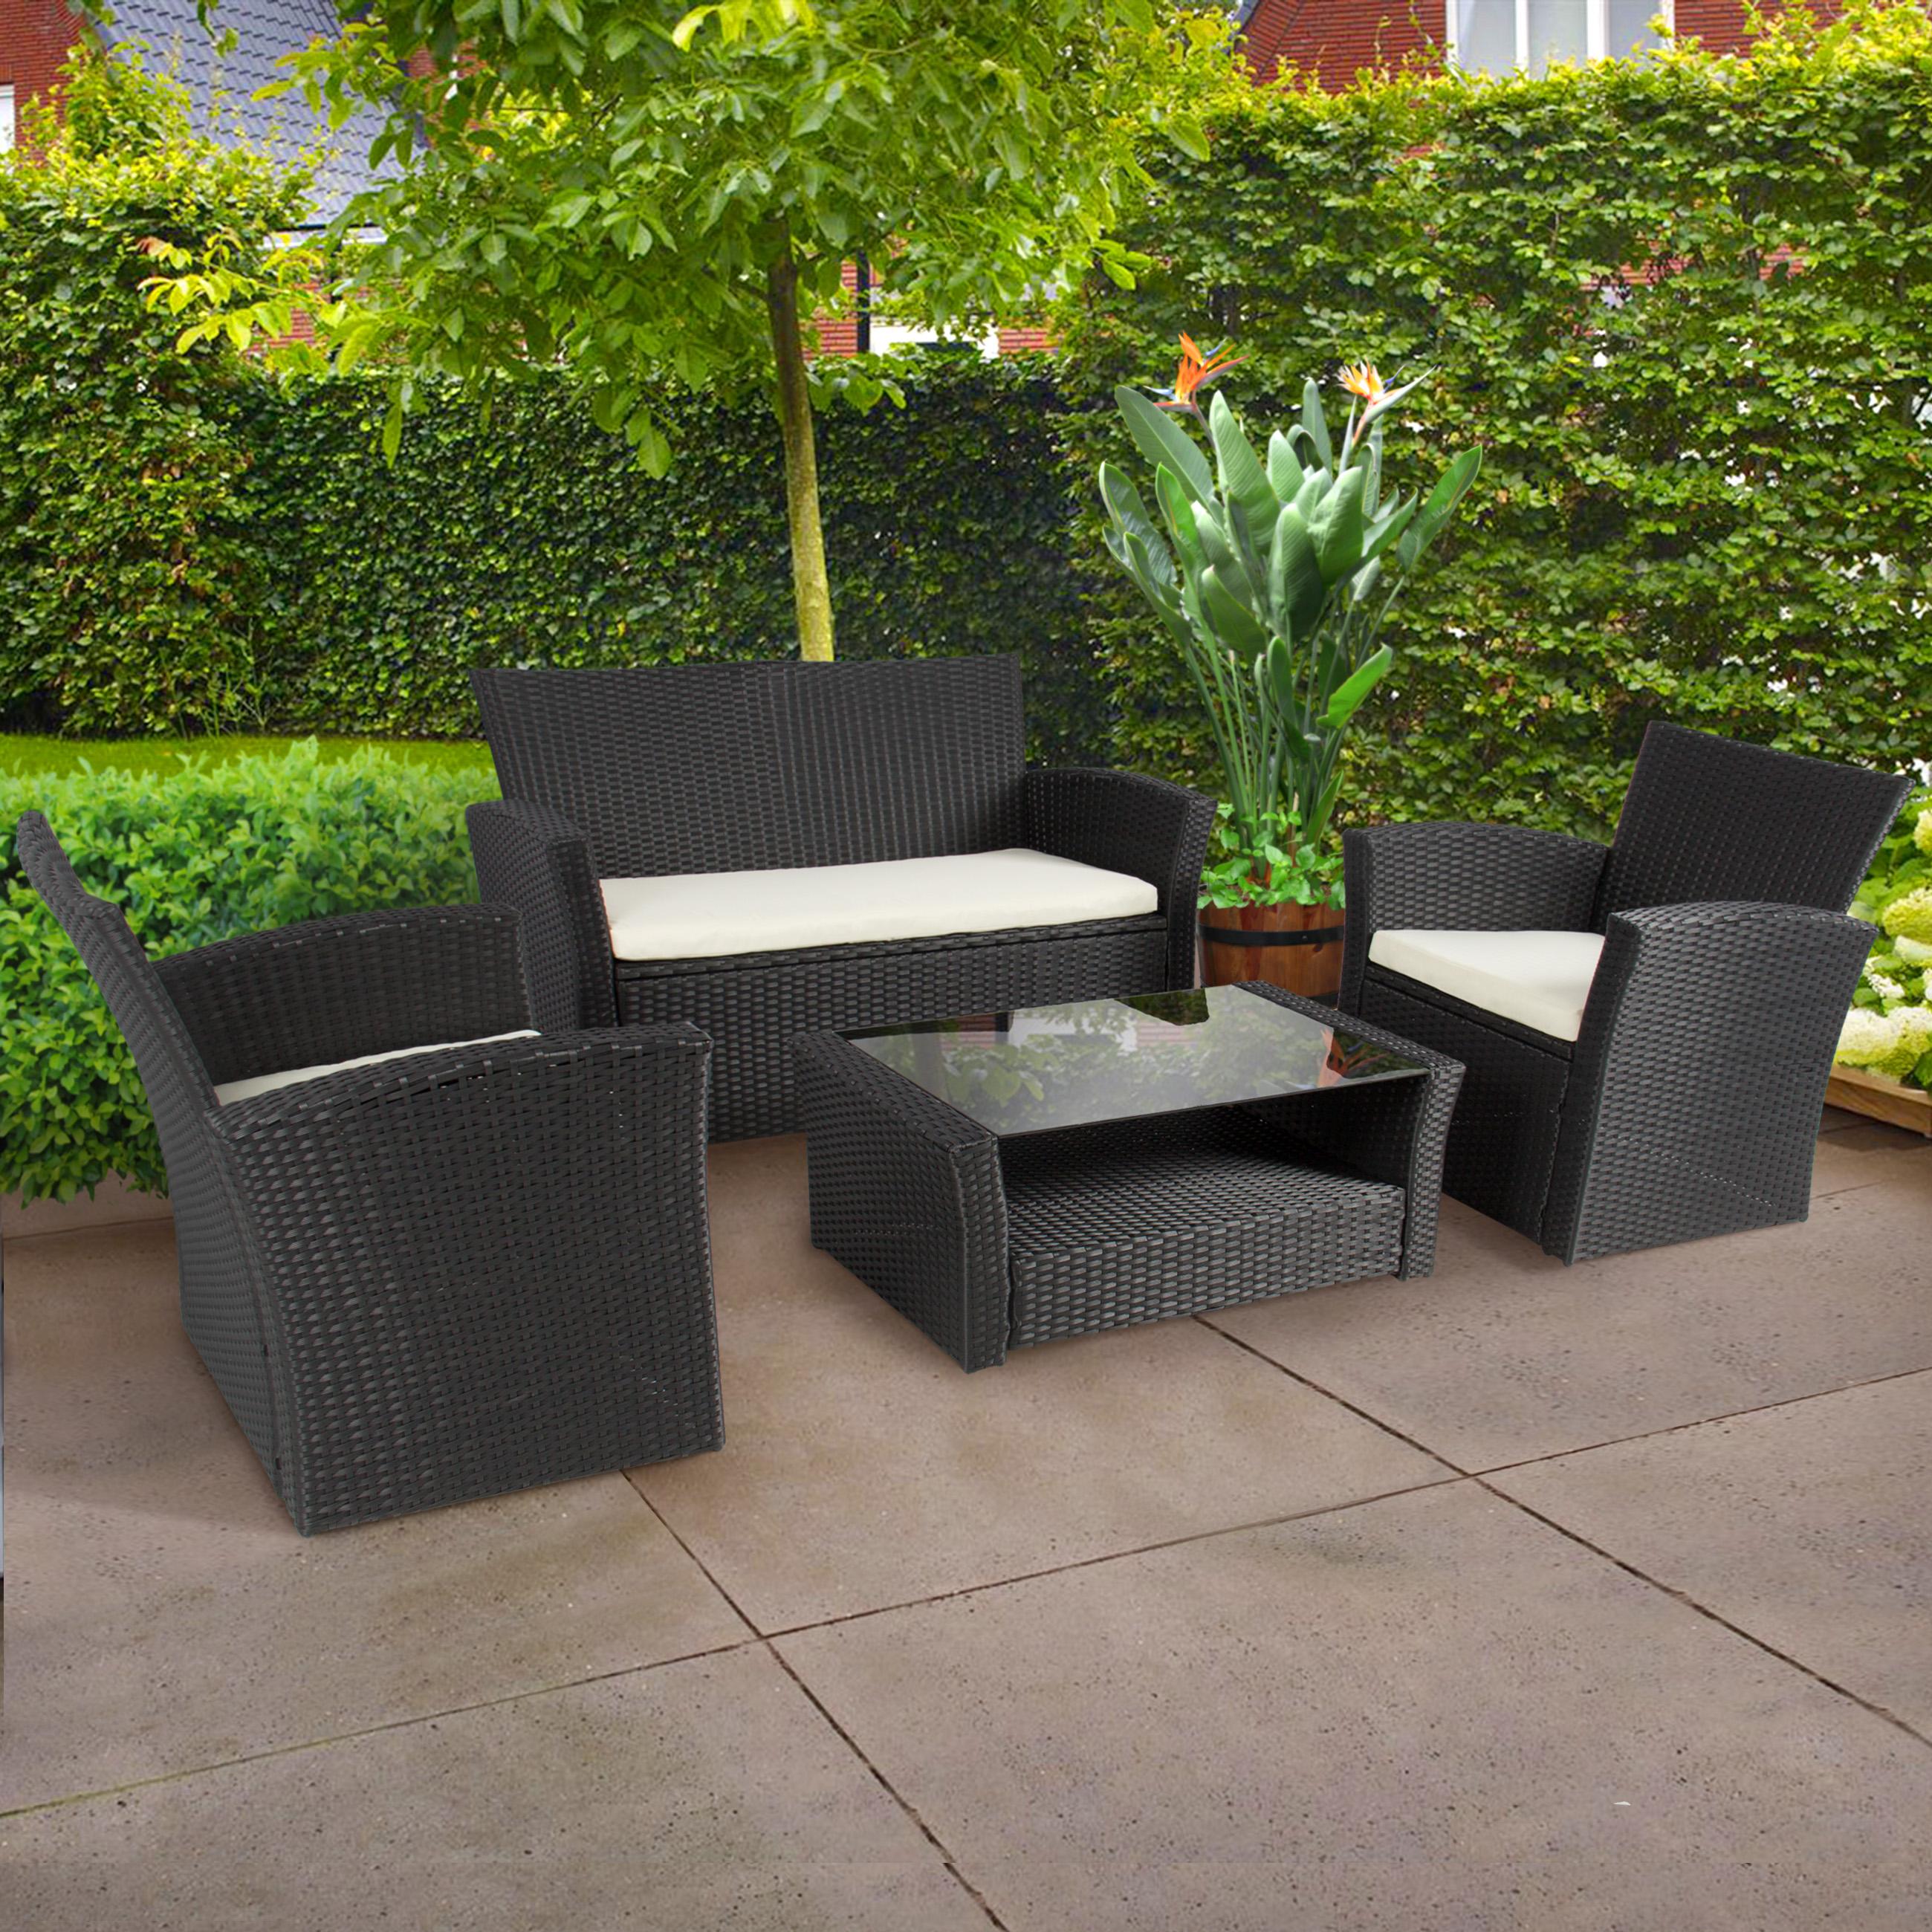 garden patio sets 4pc outdoor patio garden furniture wicker rattan sofa set black - VGXOZYK